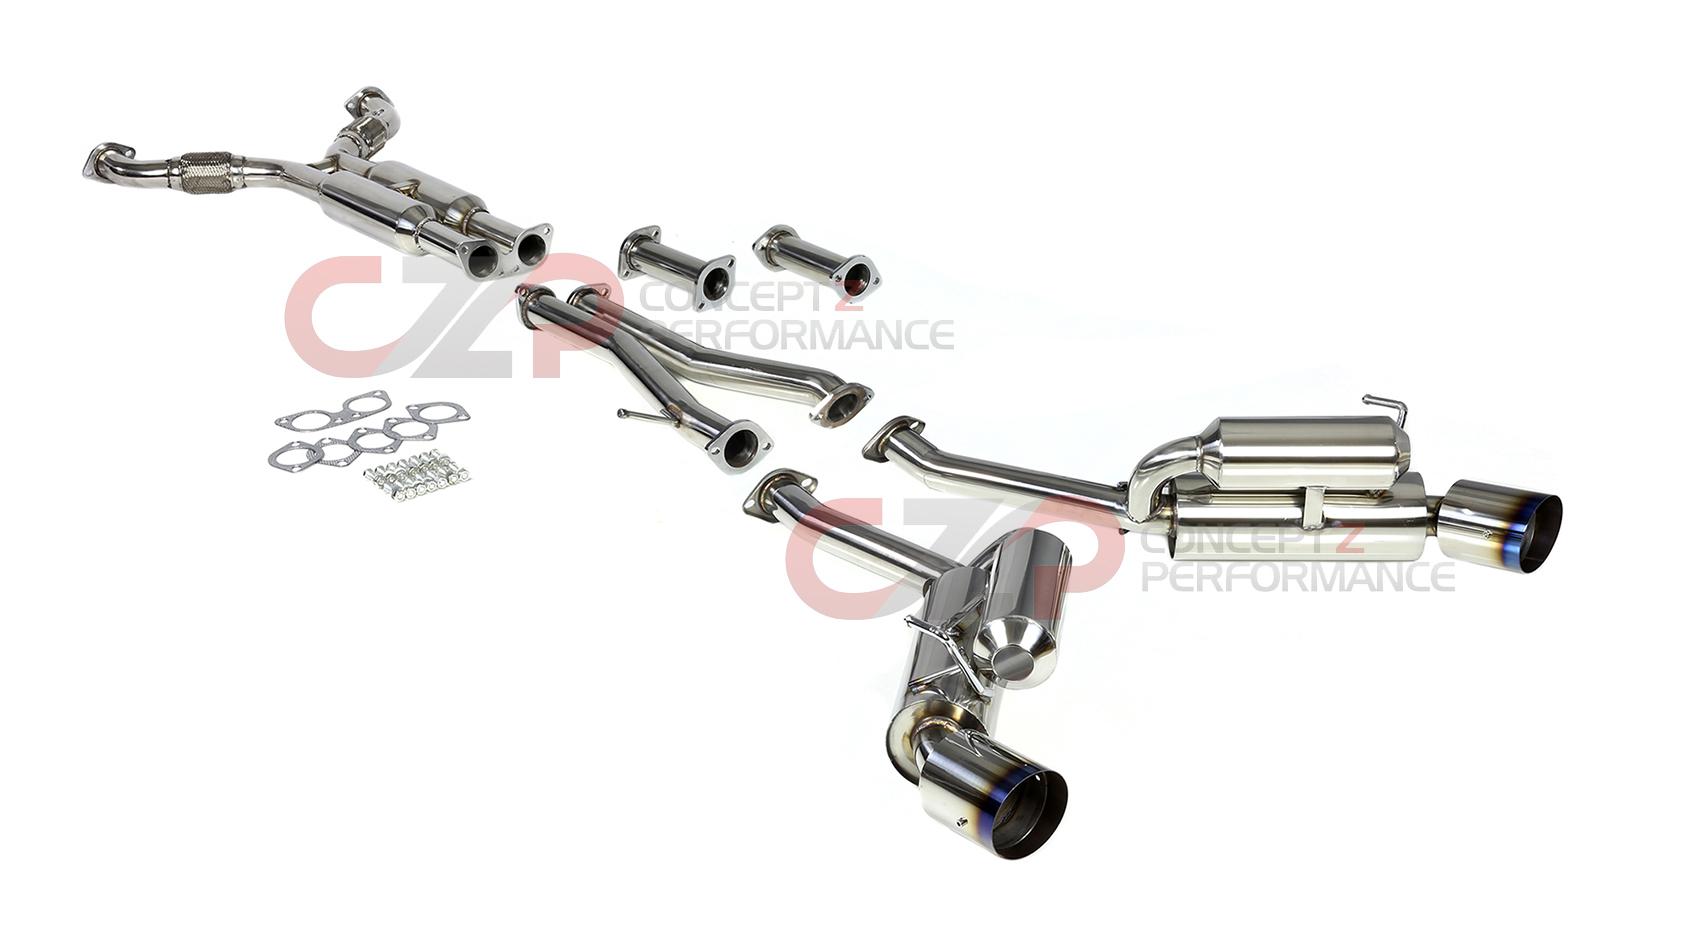 Dna Motoring True Dual Catback Exhaust System W Burnt Tips